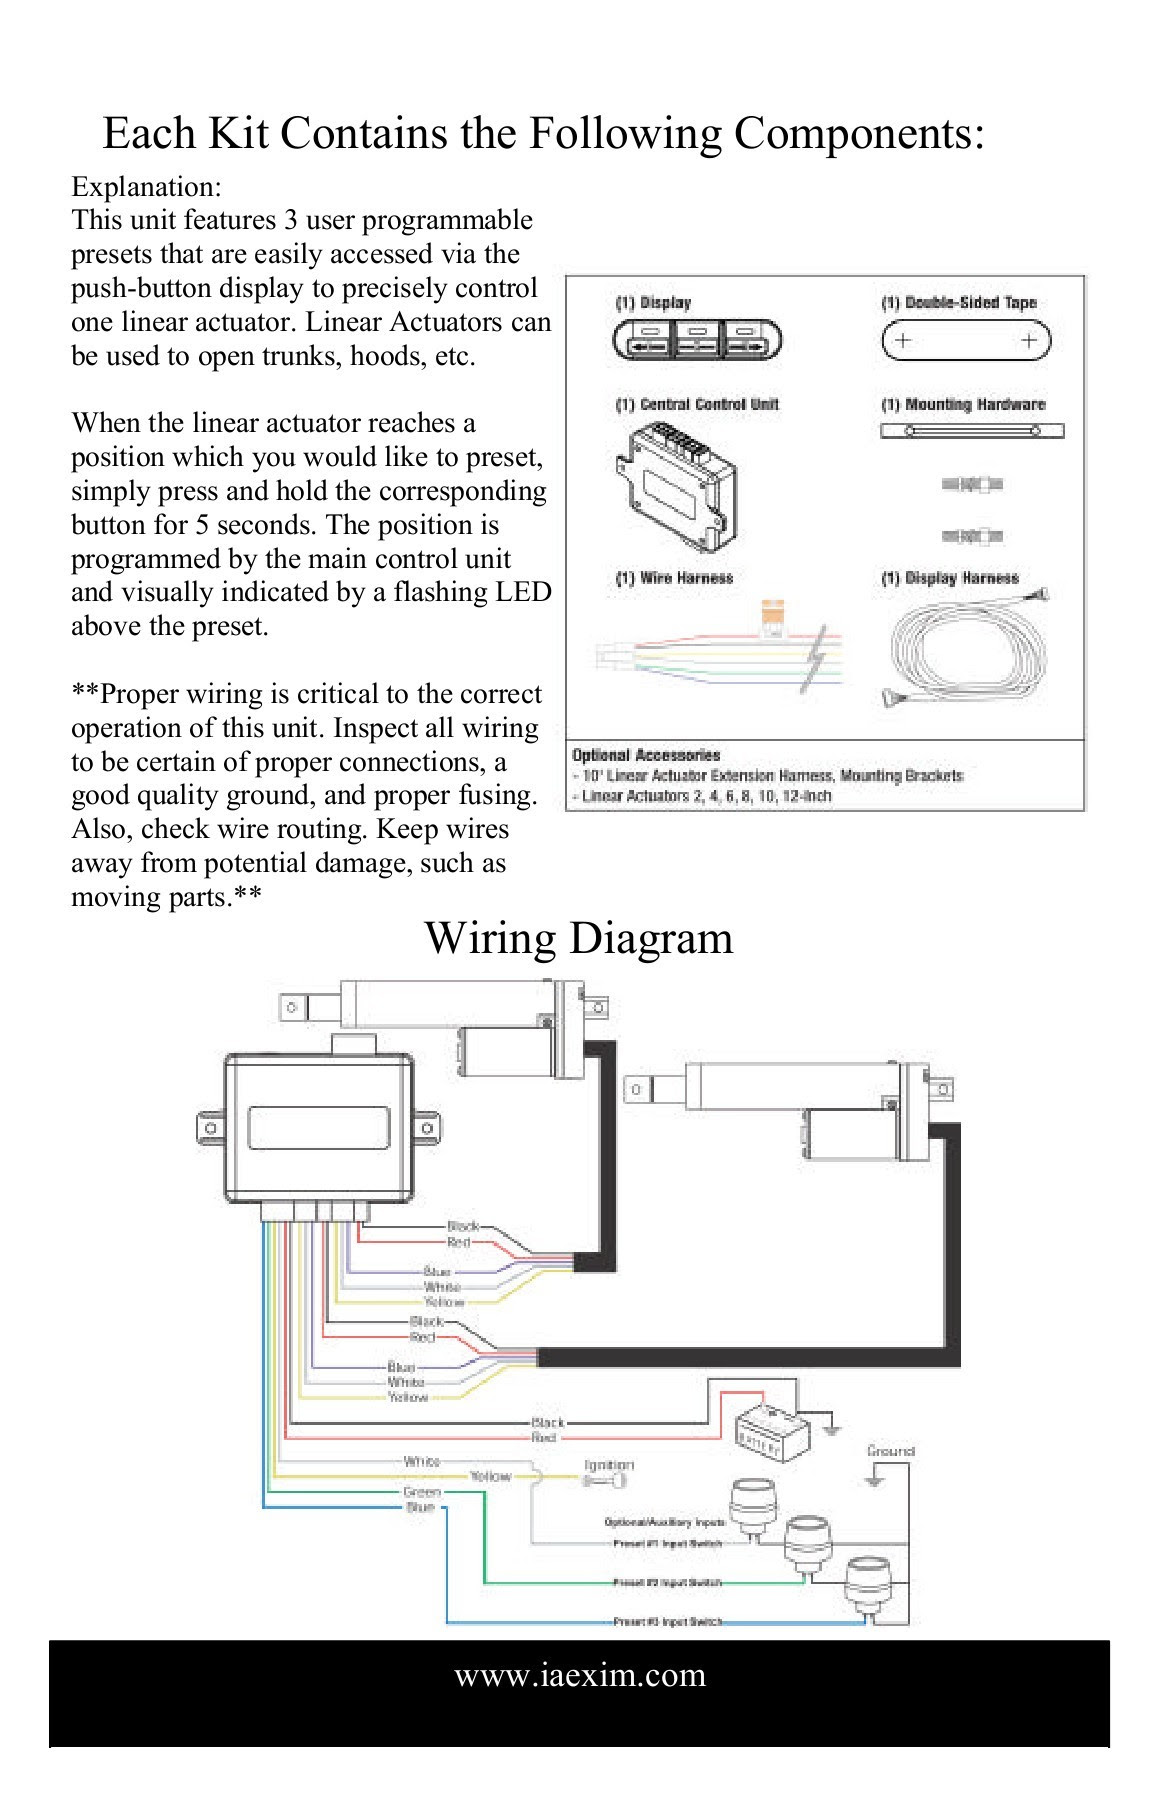 Actuator In Wiring Diagram